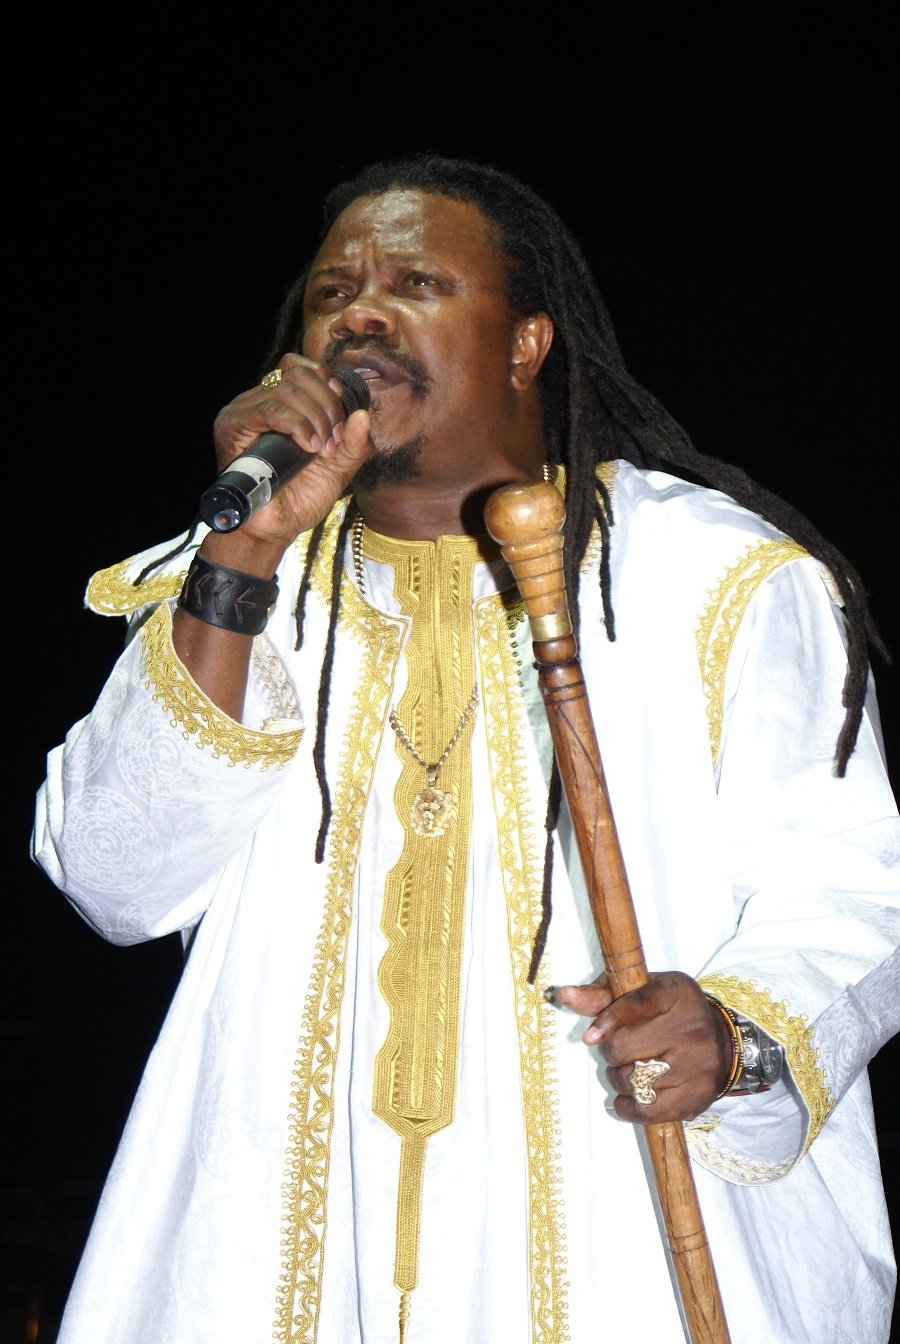 Reggae legend Luciano The Messenger